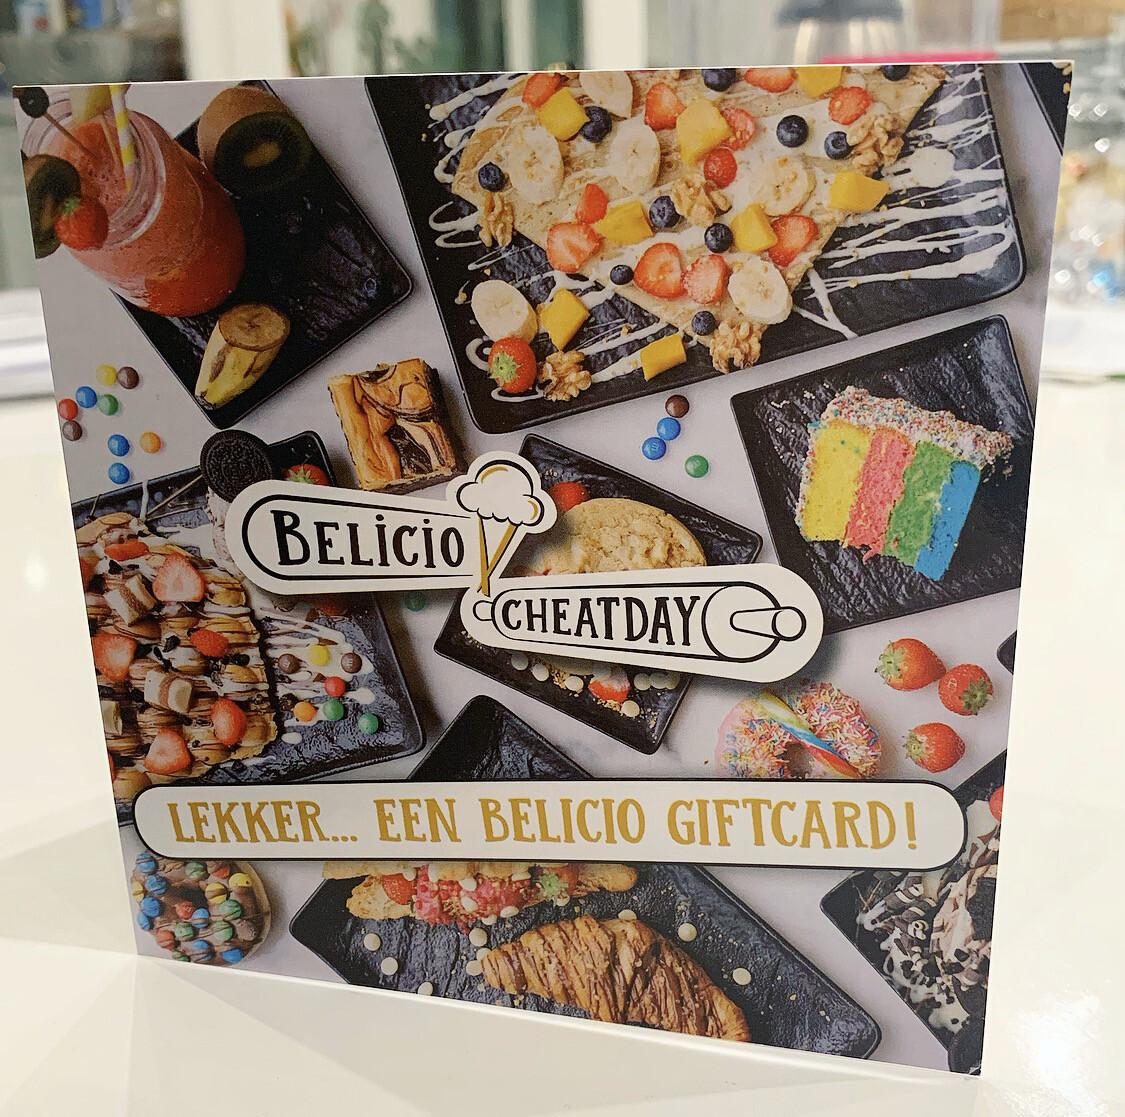 Giftcard Voor Cheatday Stores twv. €30,-